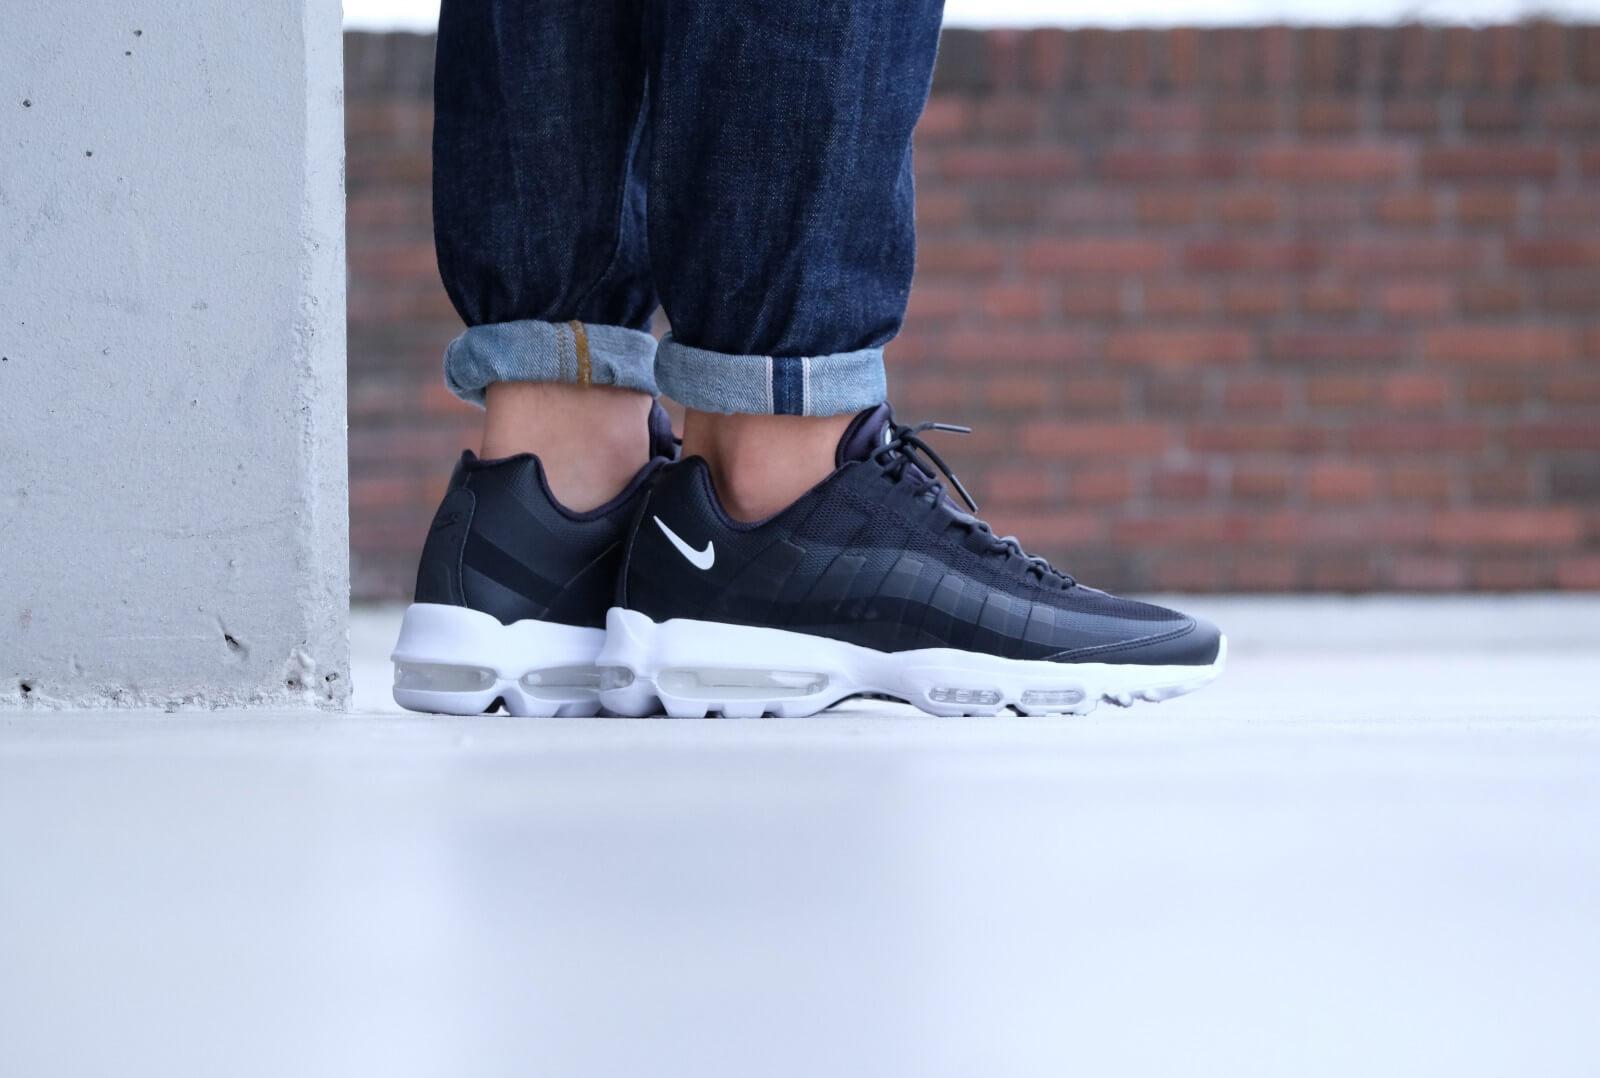 Nike Air Max 95 Ultra Essential | Urban outfits, Street wear